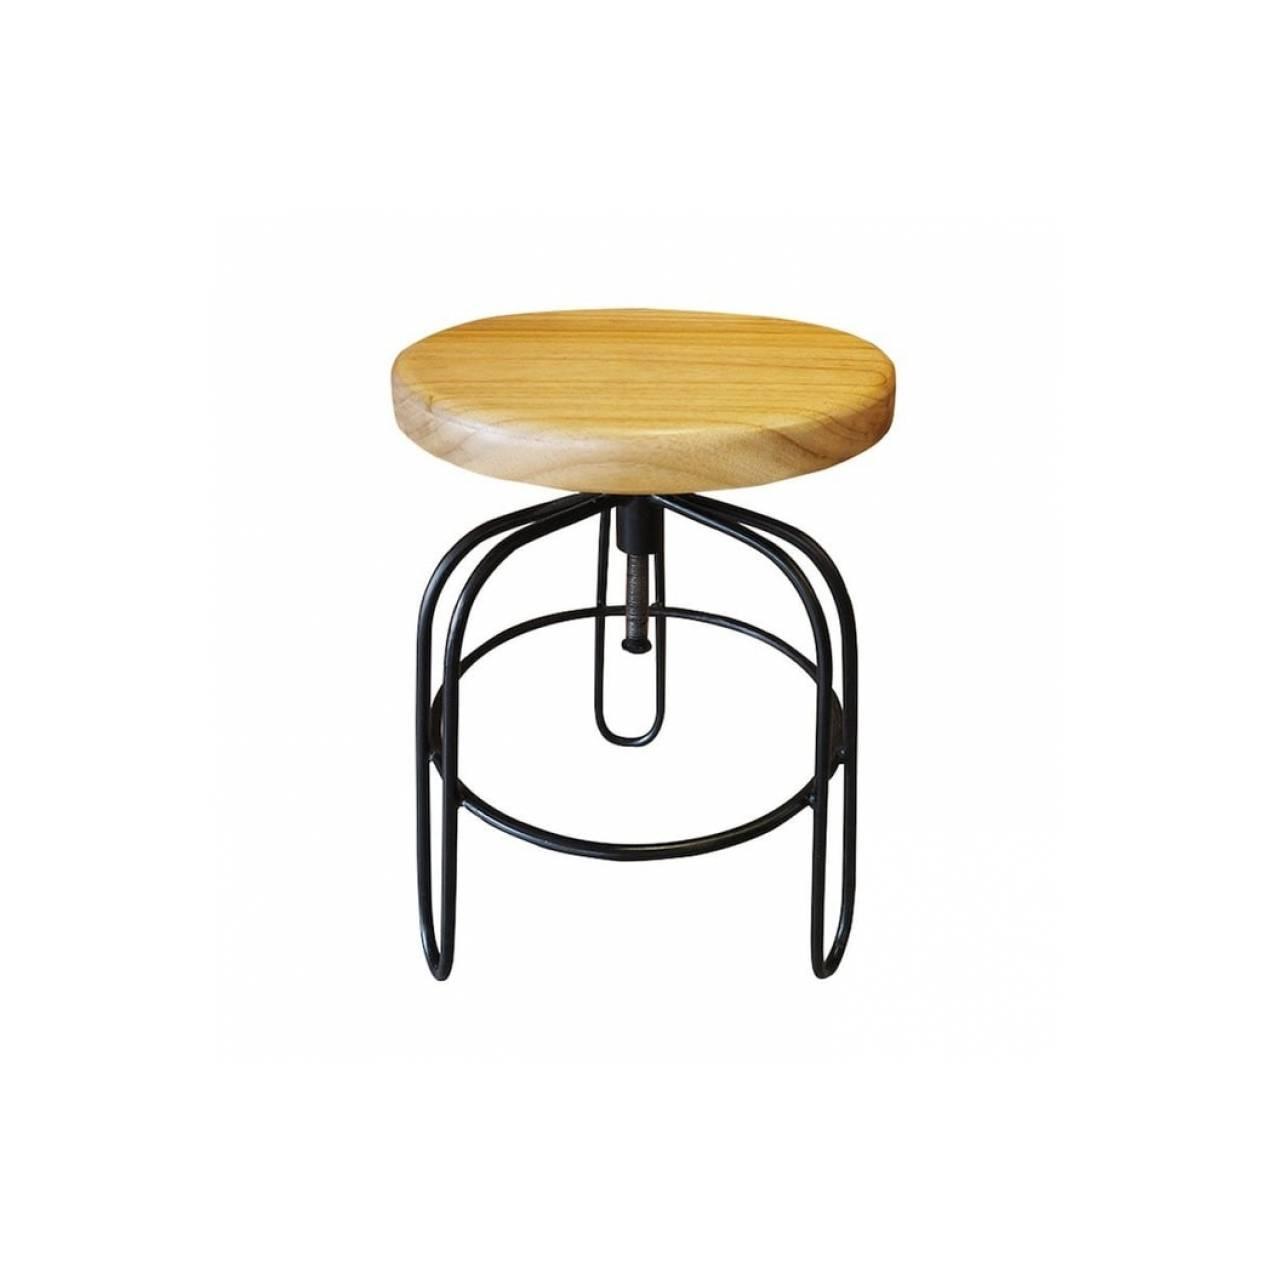 Anyer | dining chair kursi bangku kayu cafe hotel furniture modern